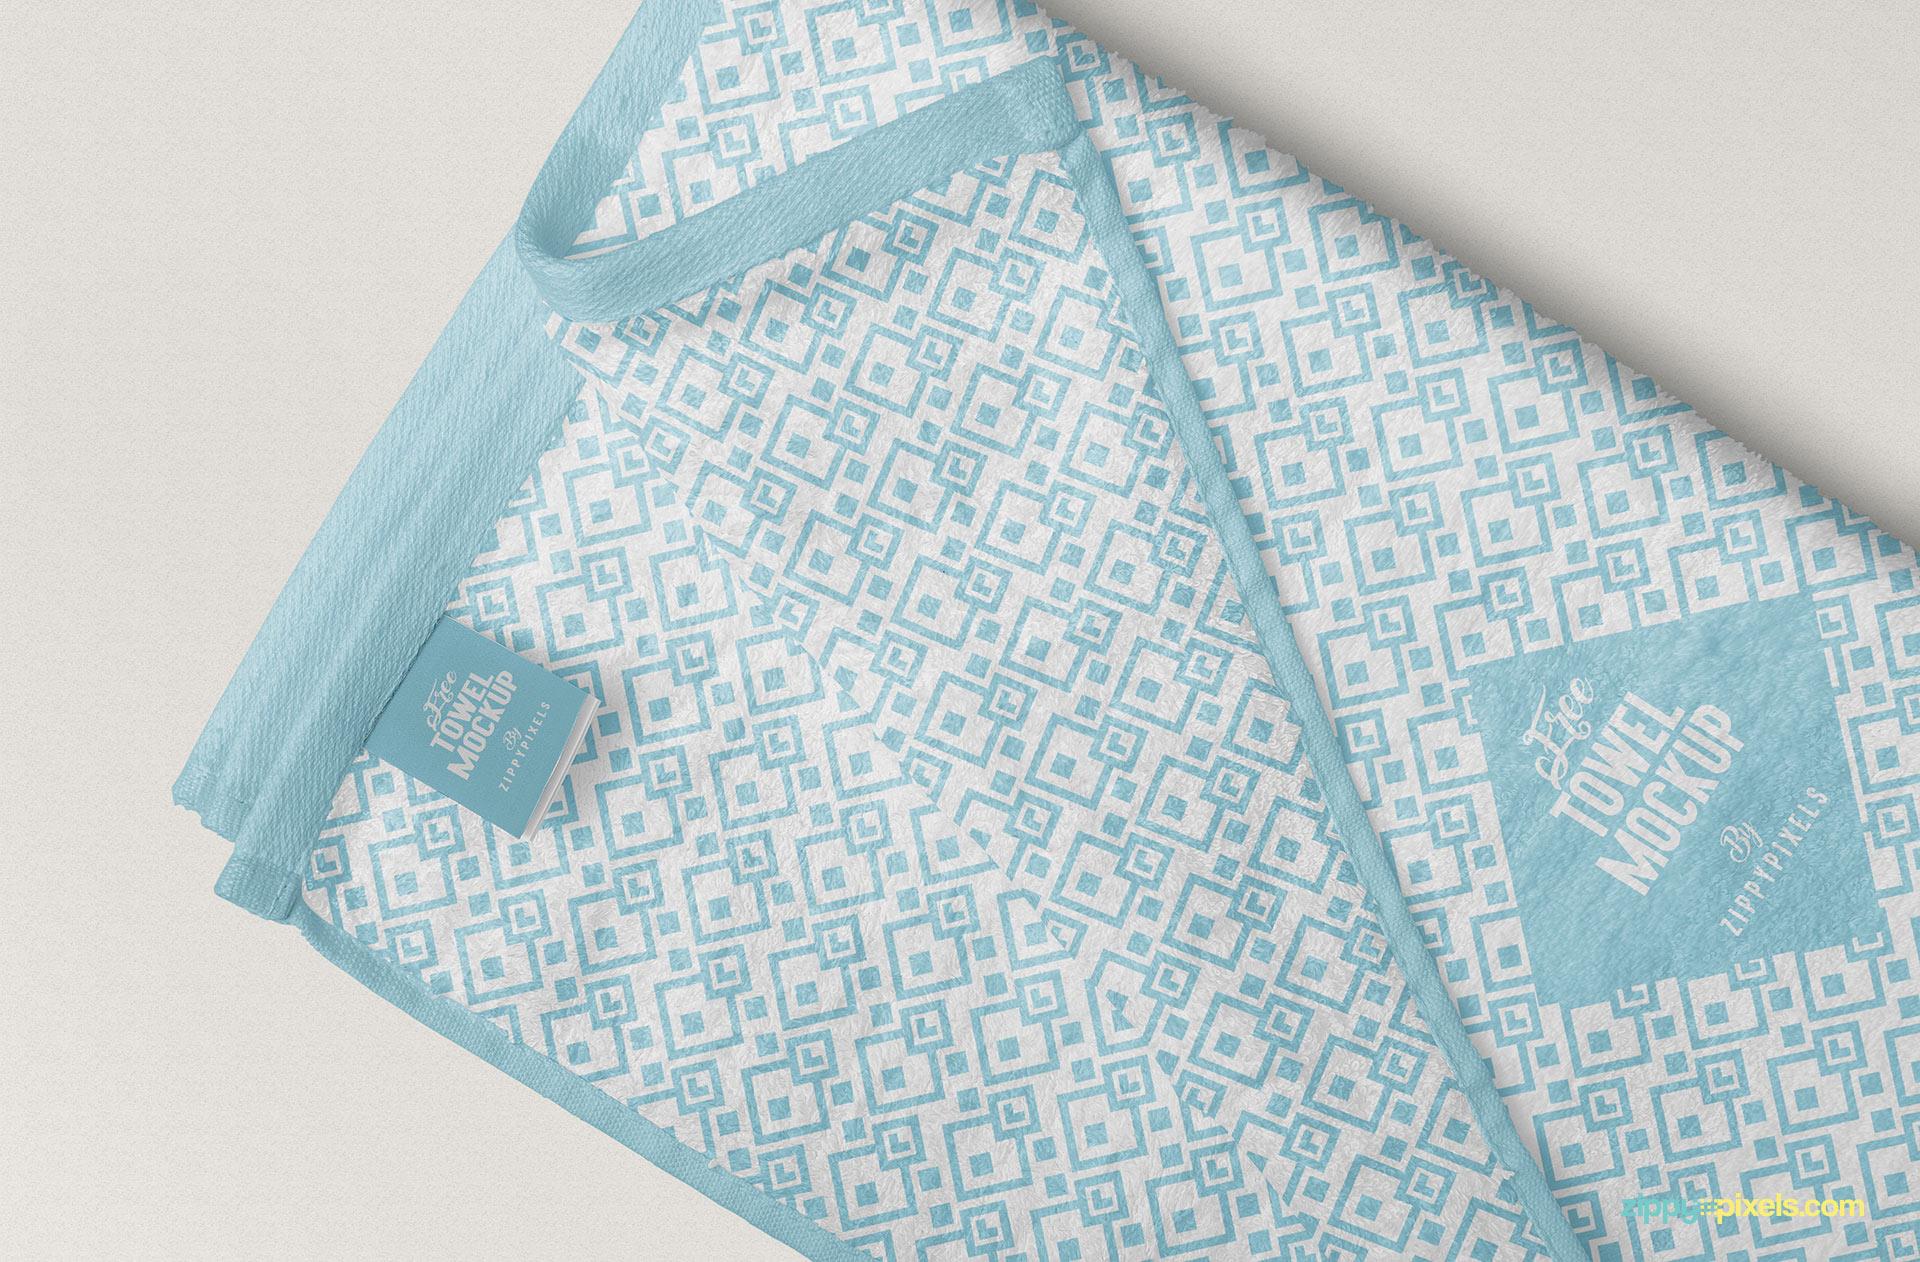 Towel mockup free PSD.